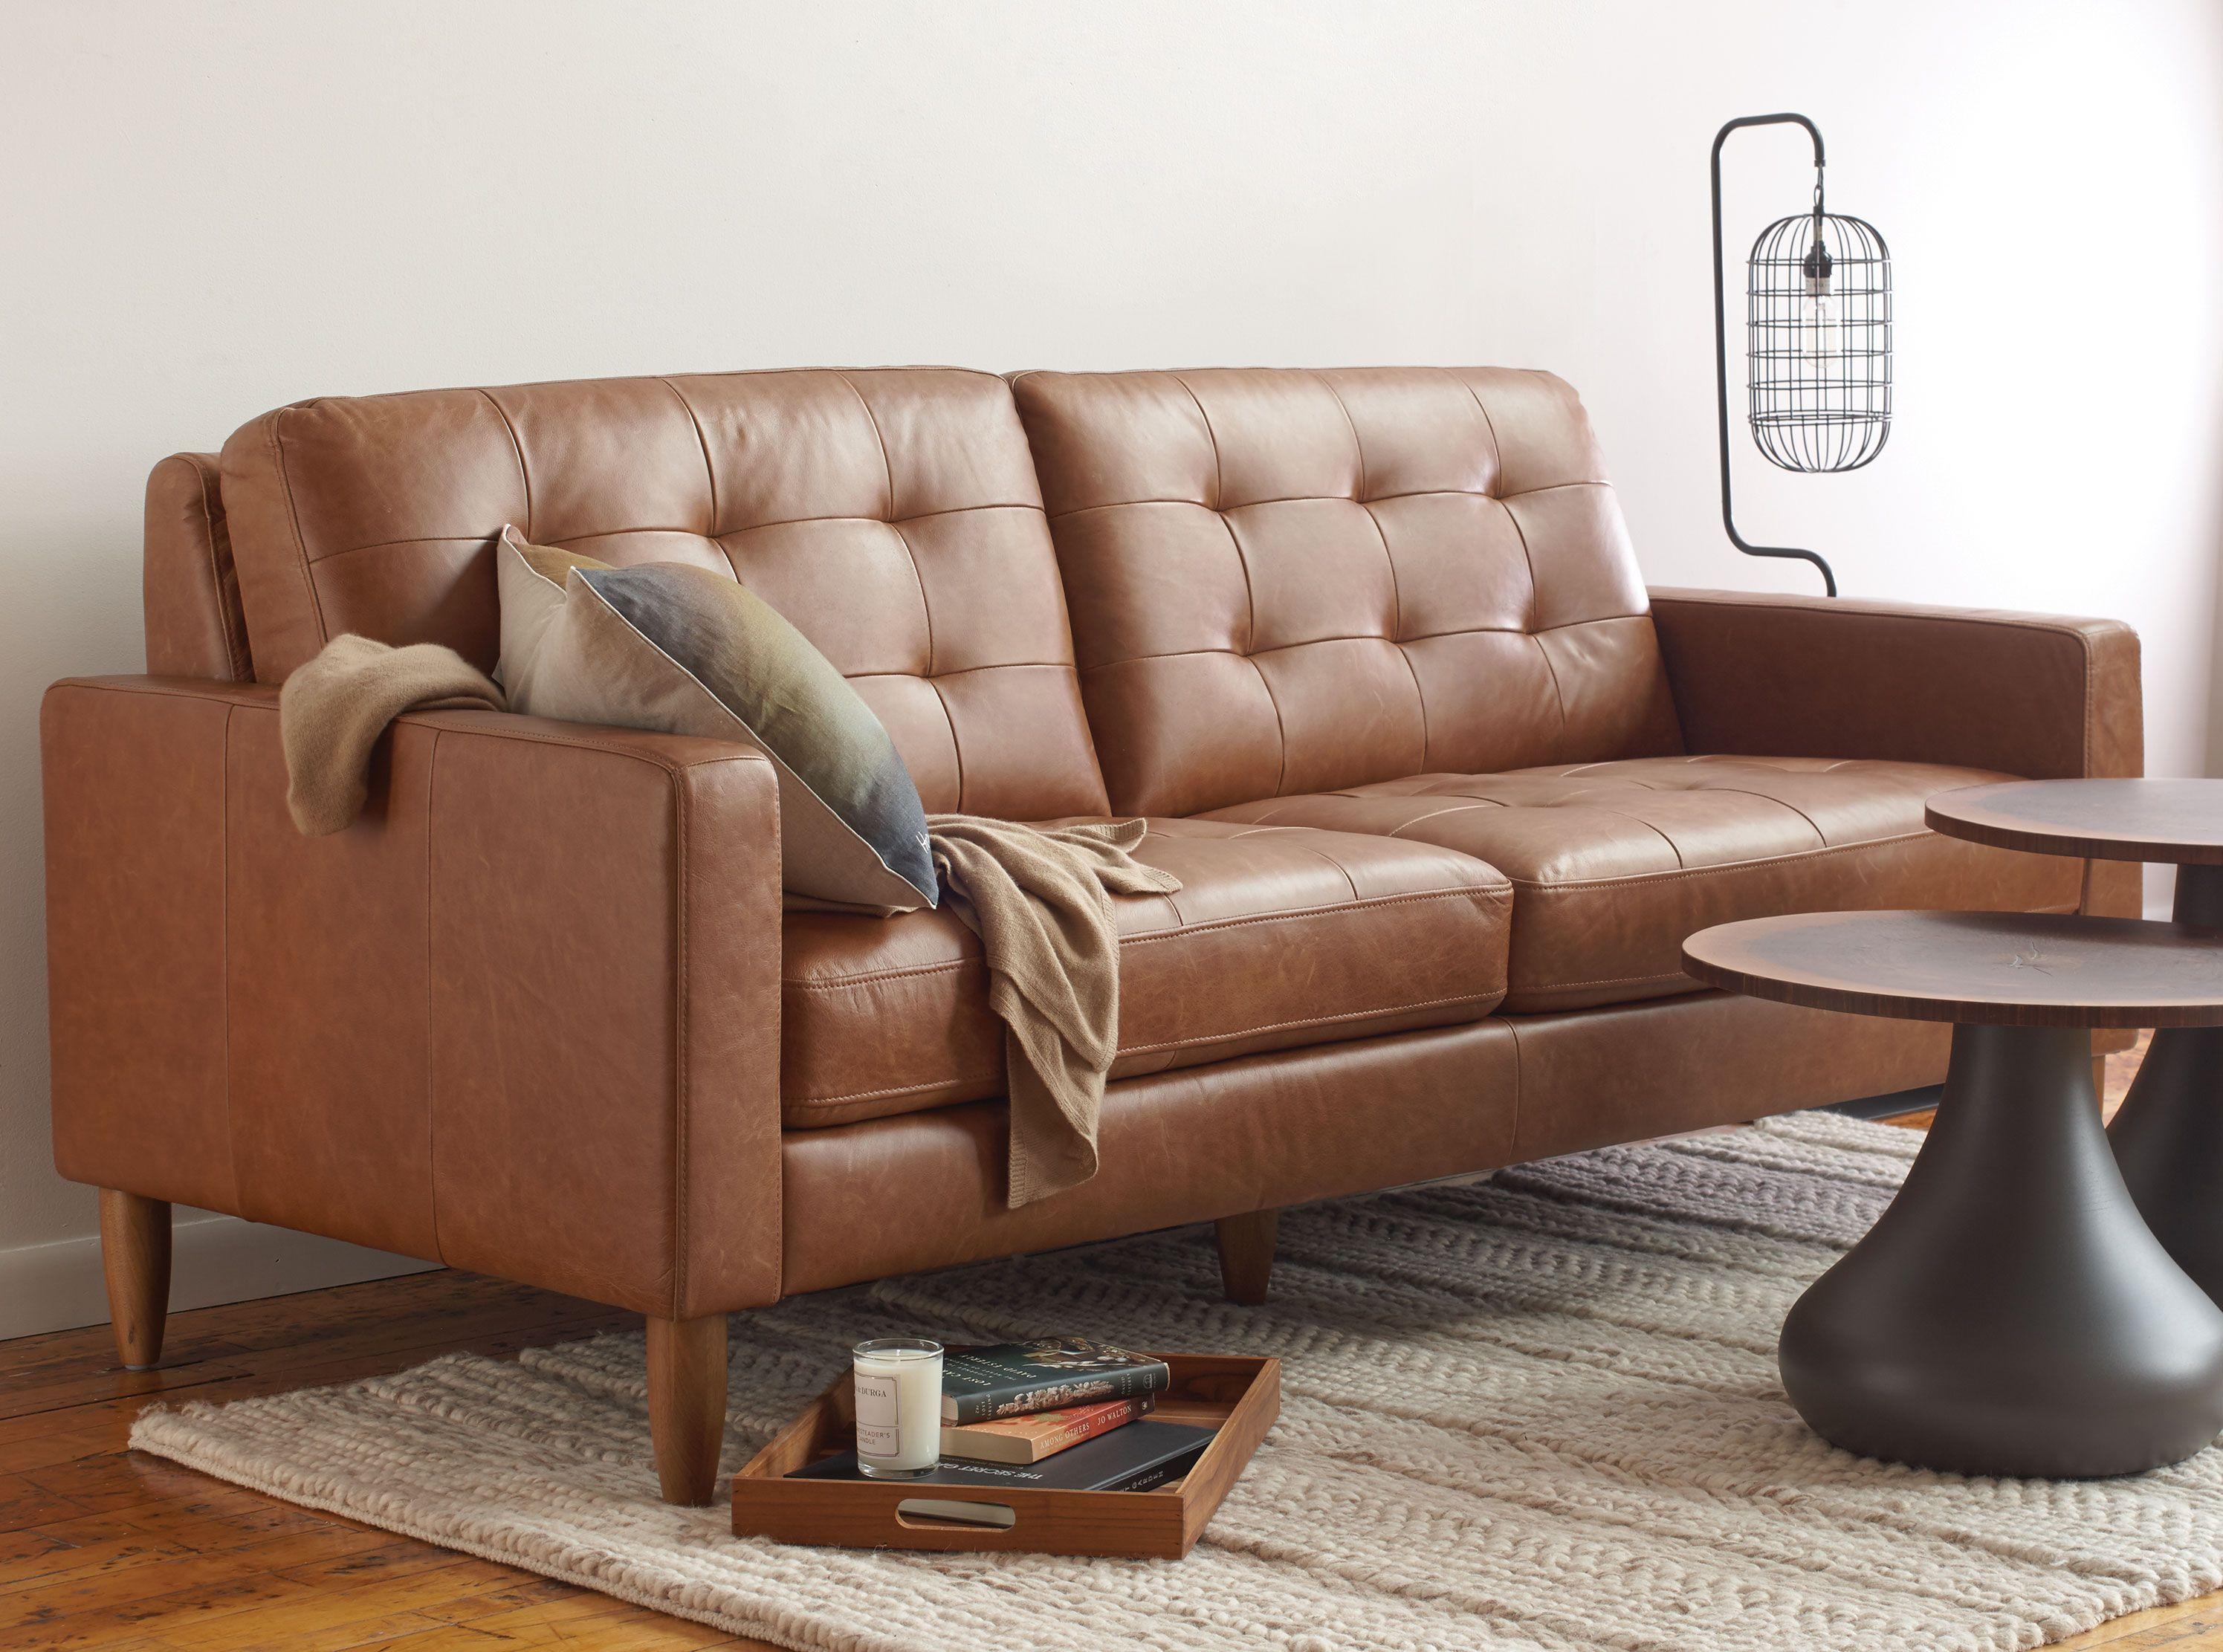 Sydney Sofa In Vintage Leather Kasala Leather Sofa Bed